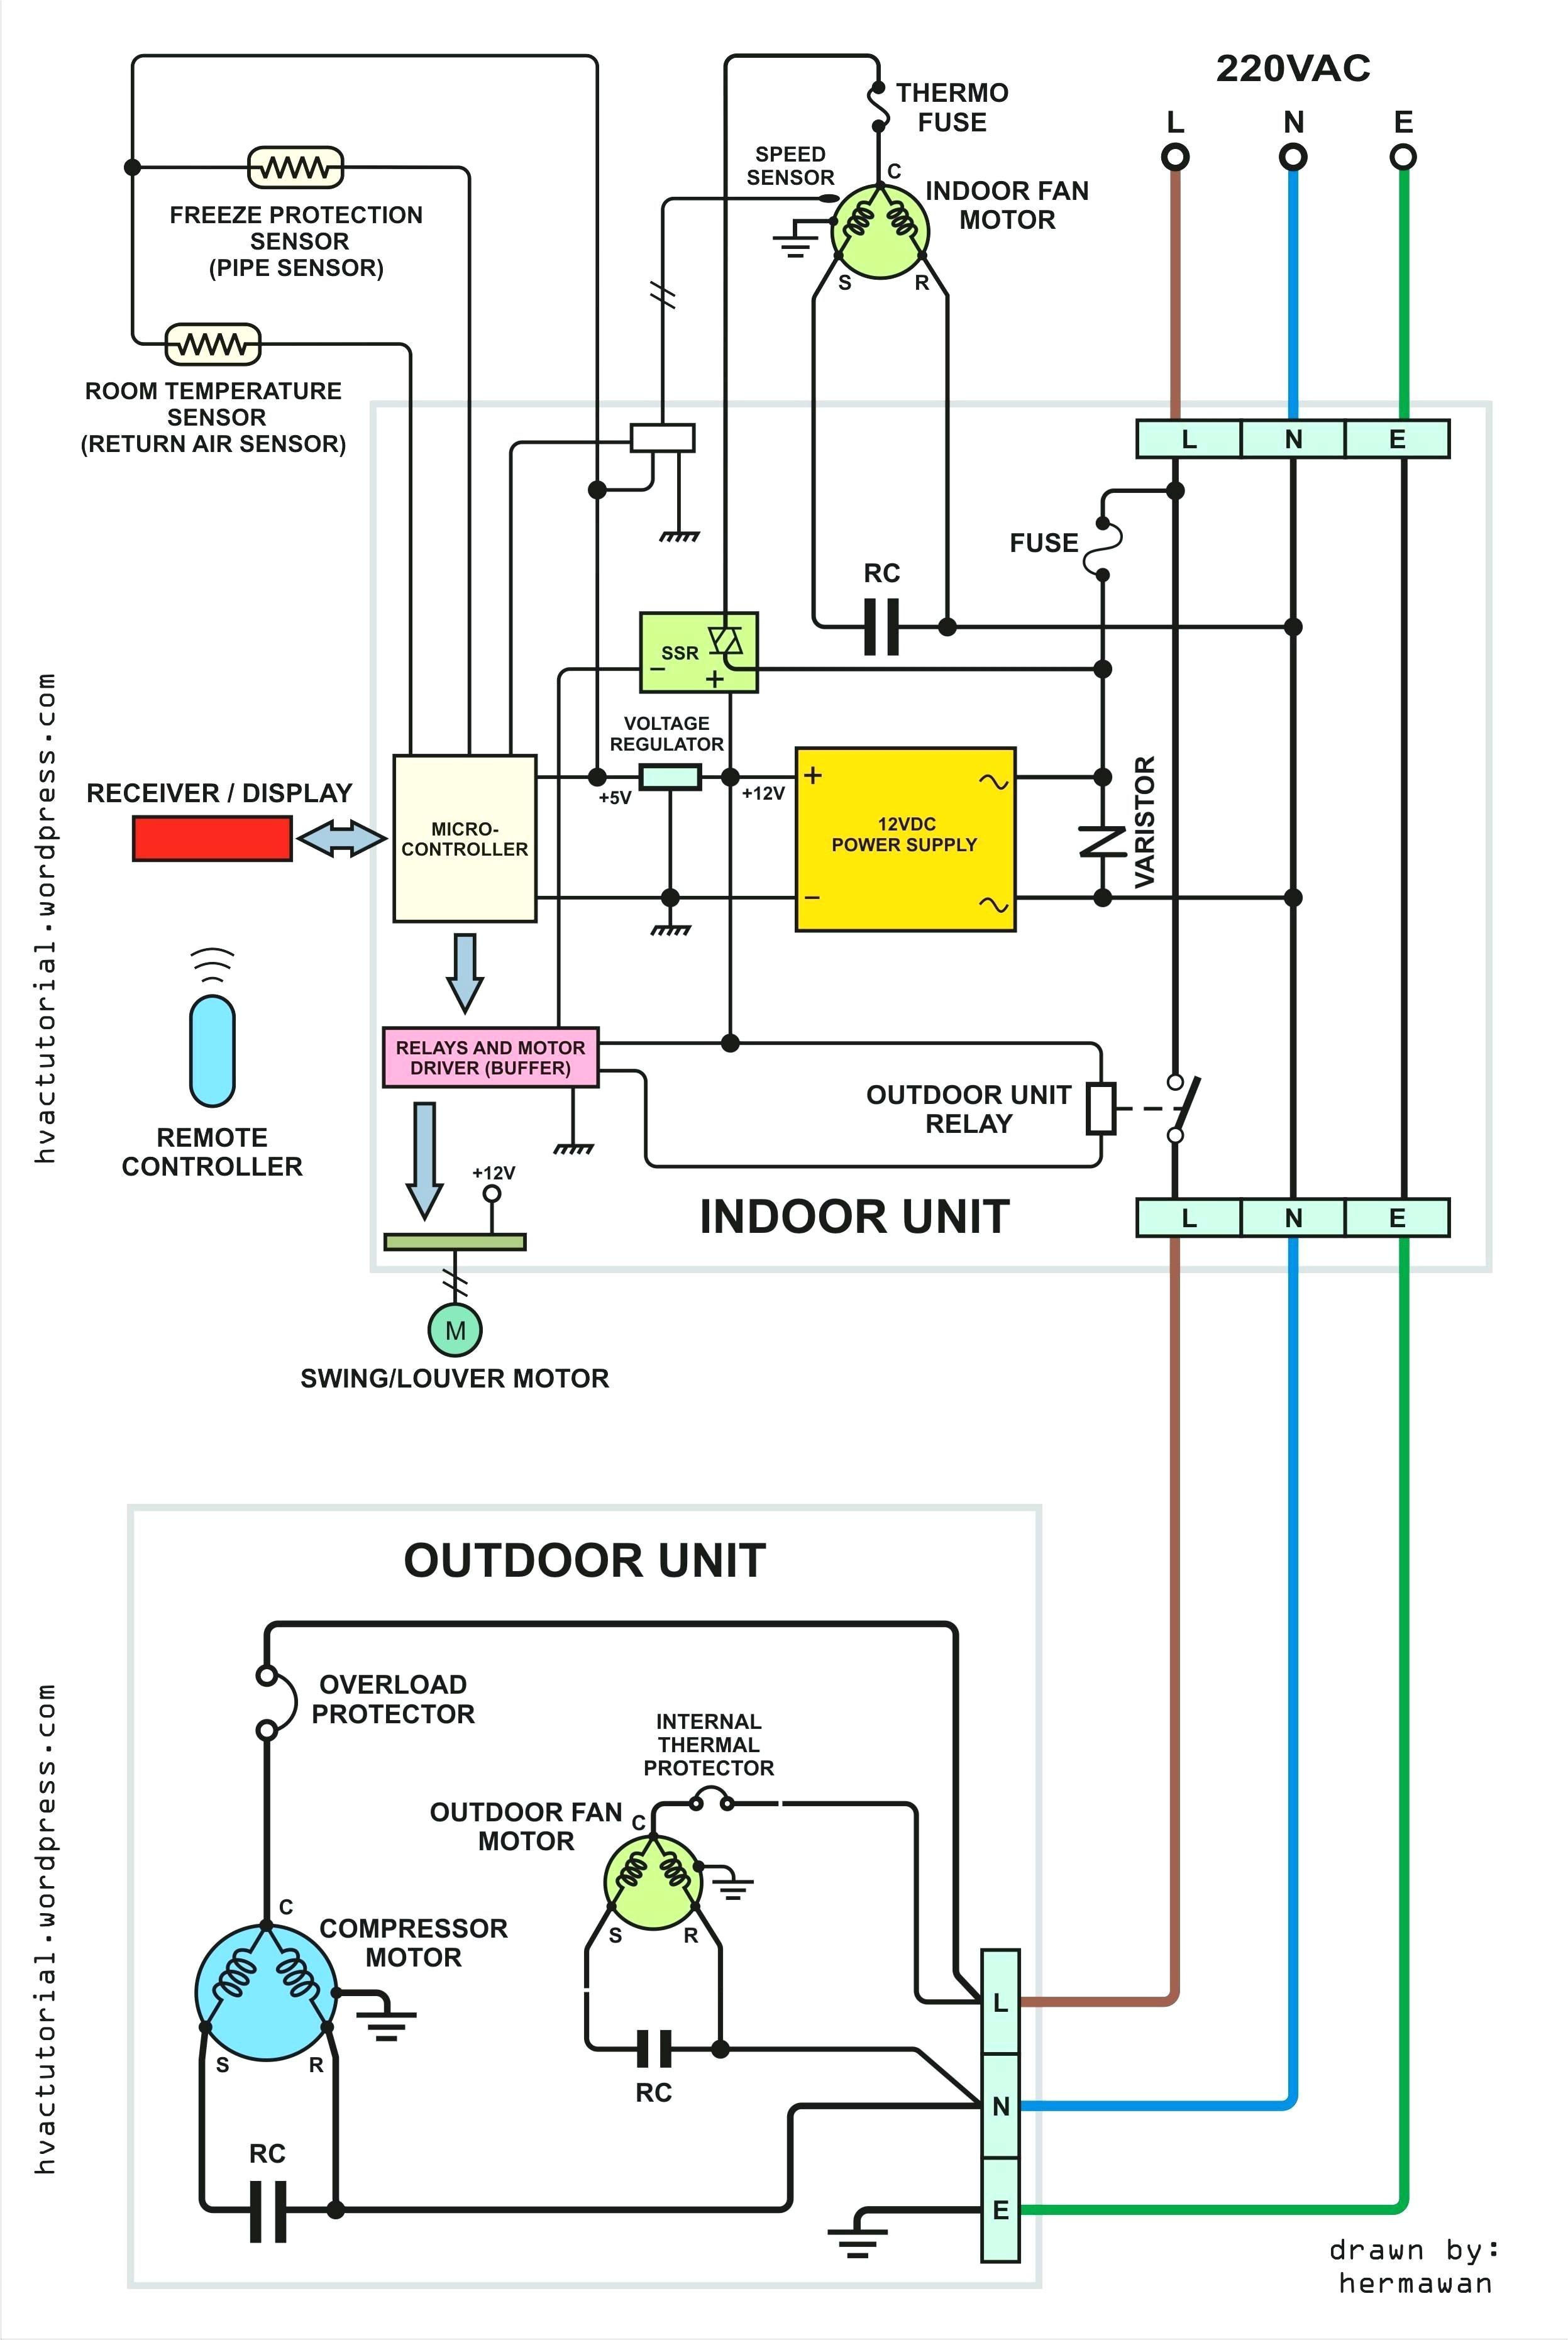 westinghouse hvac thermostat wiring wiring diagrams schema lennox furnace q3137 wiring diagram